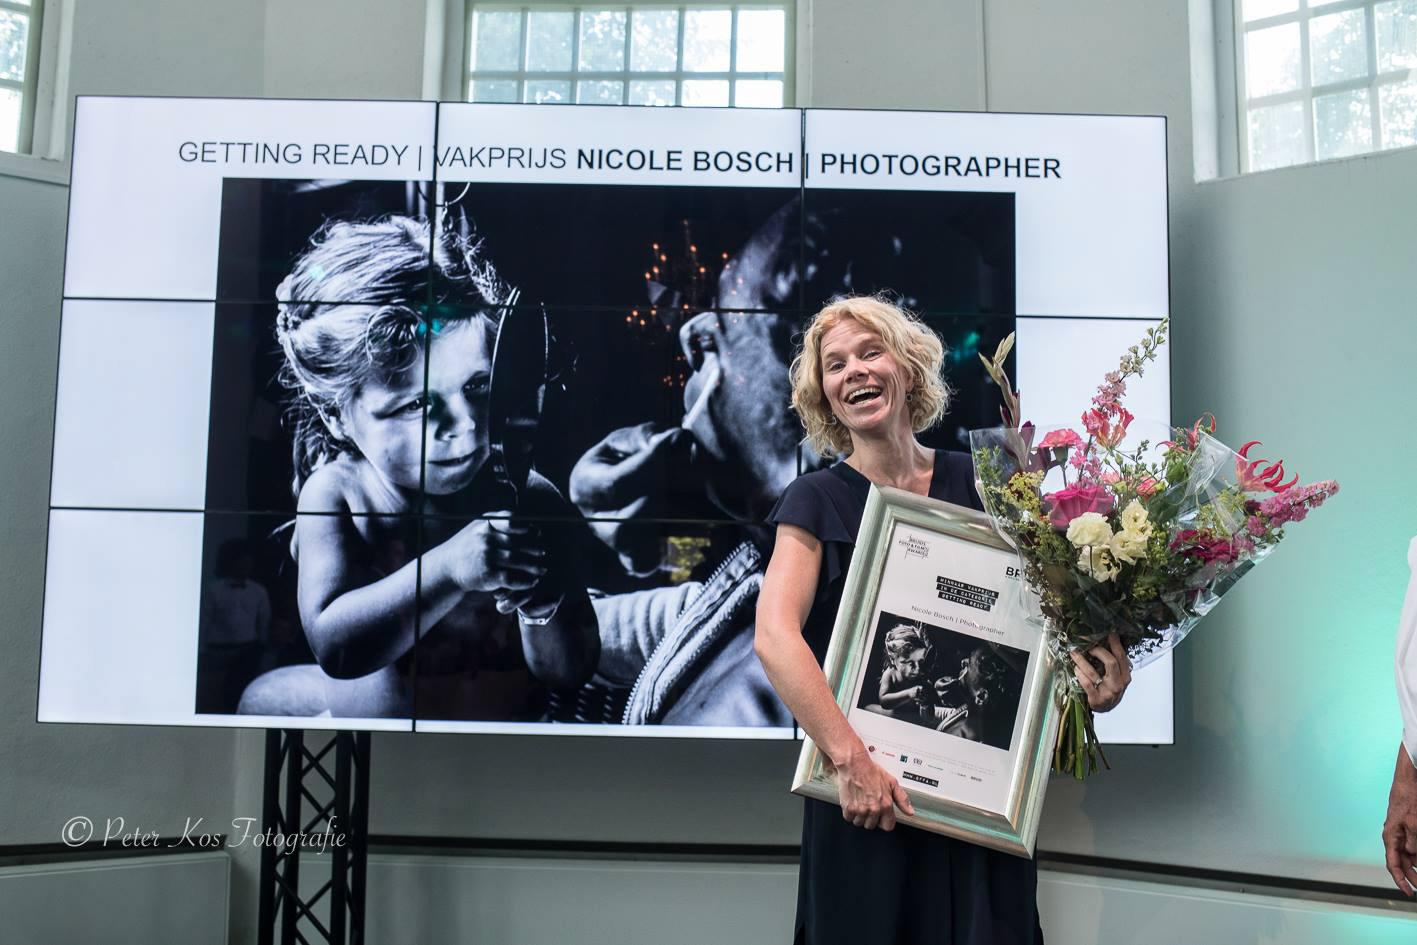 winnaar bruidsfoto Award 2018